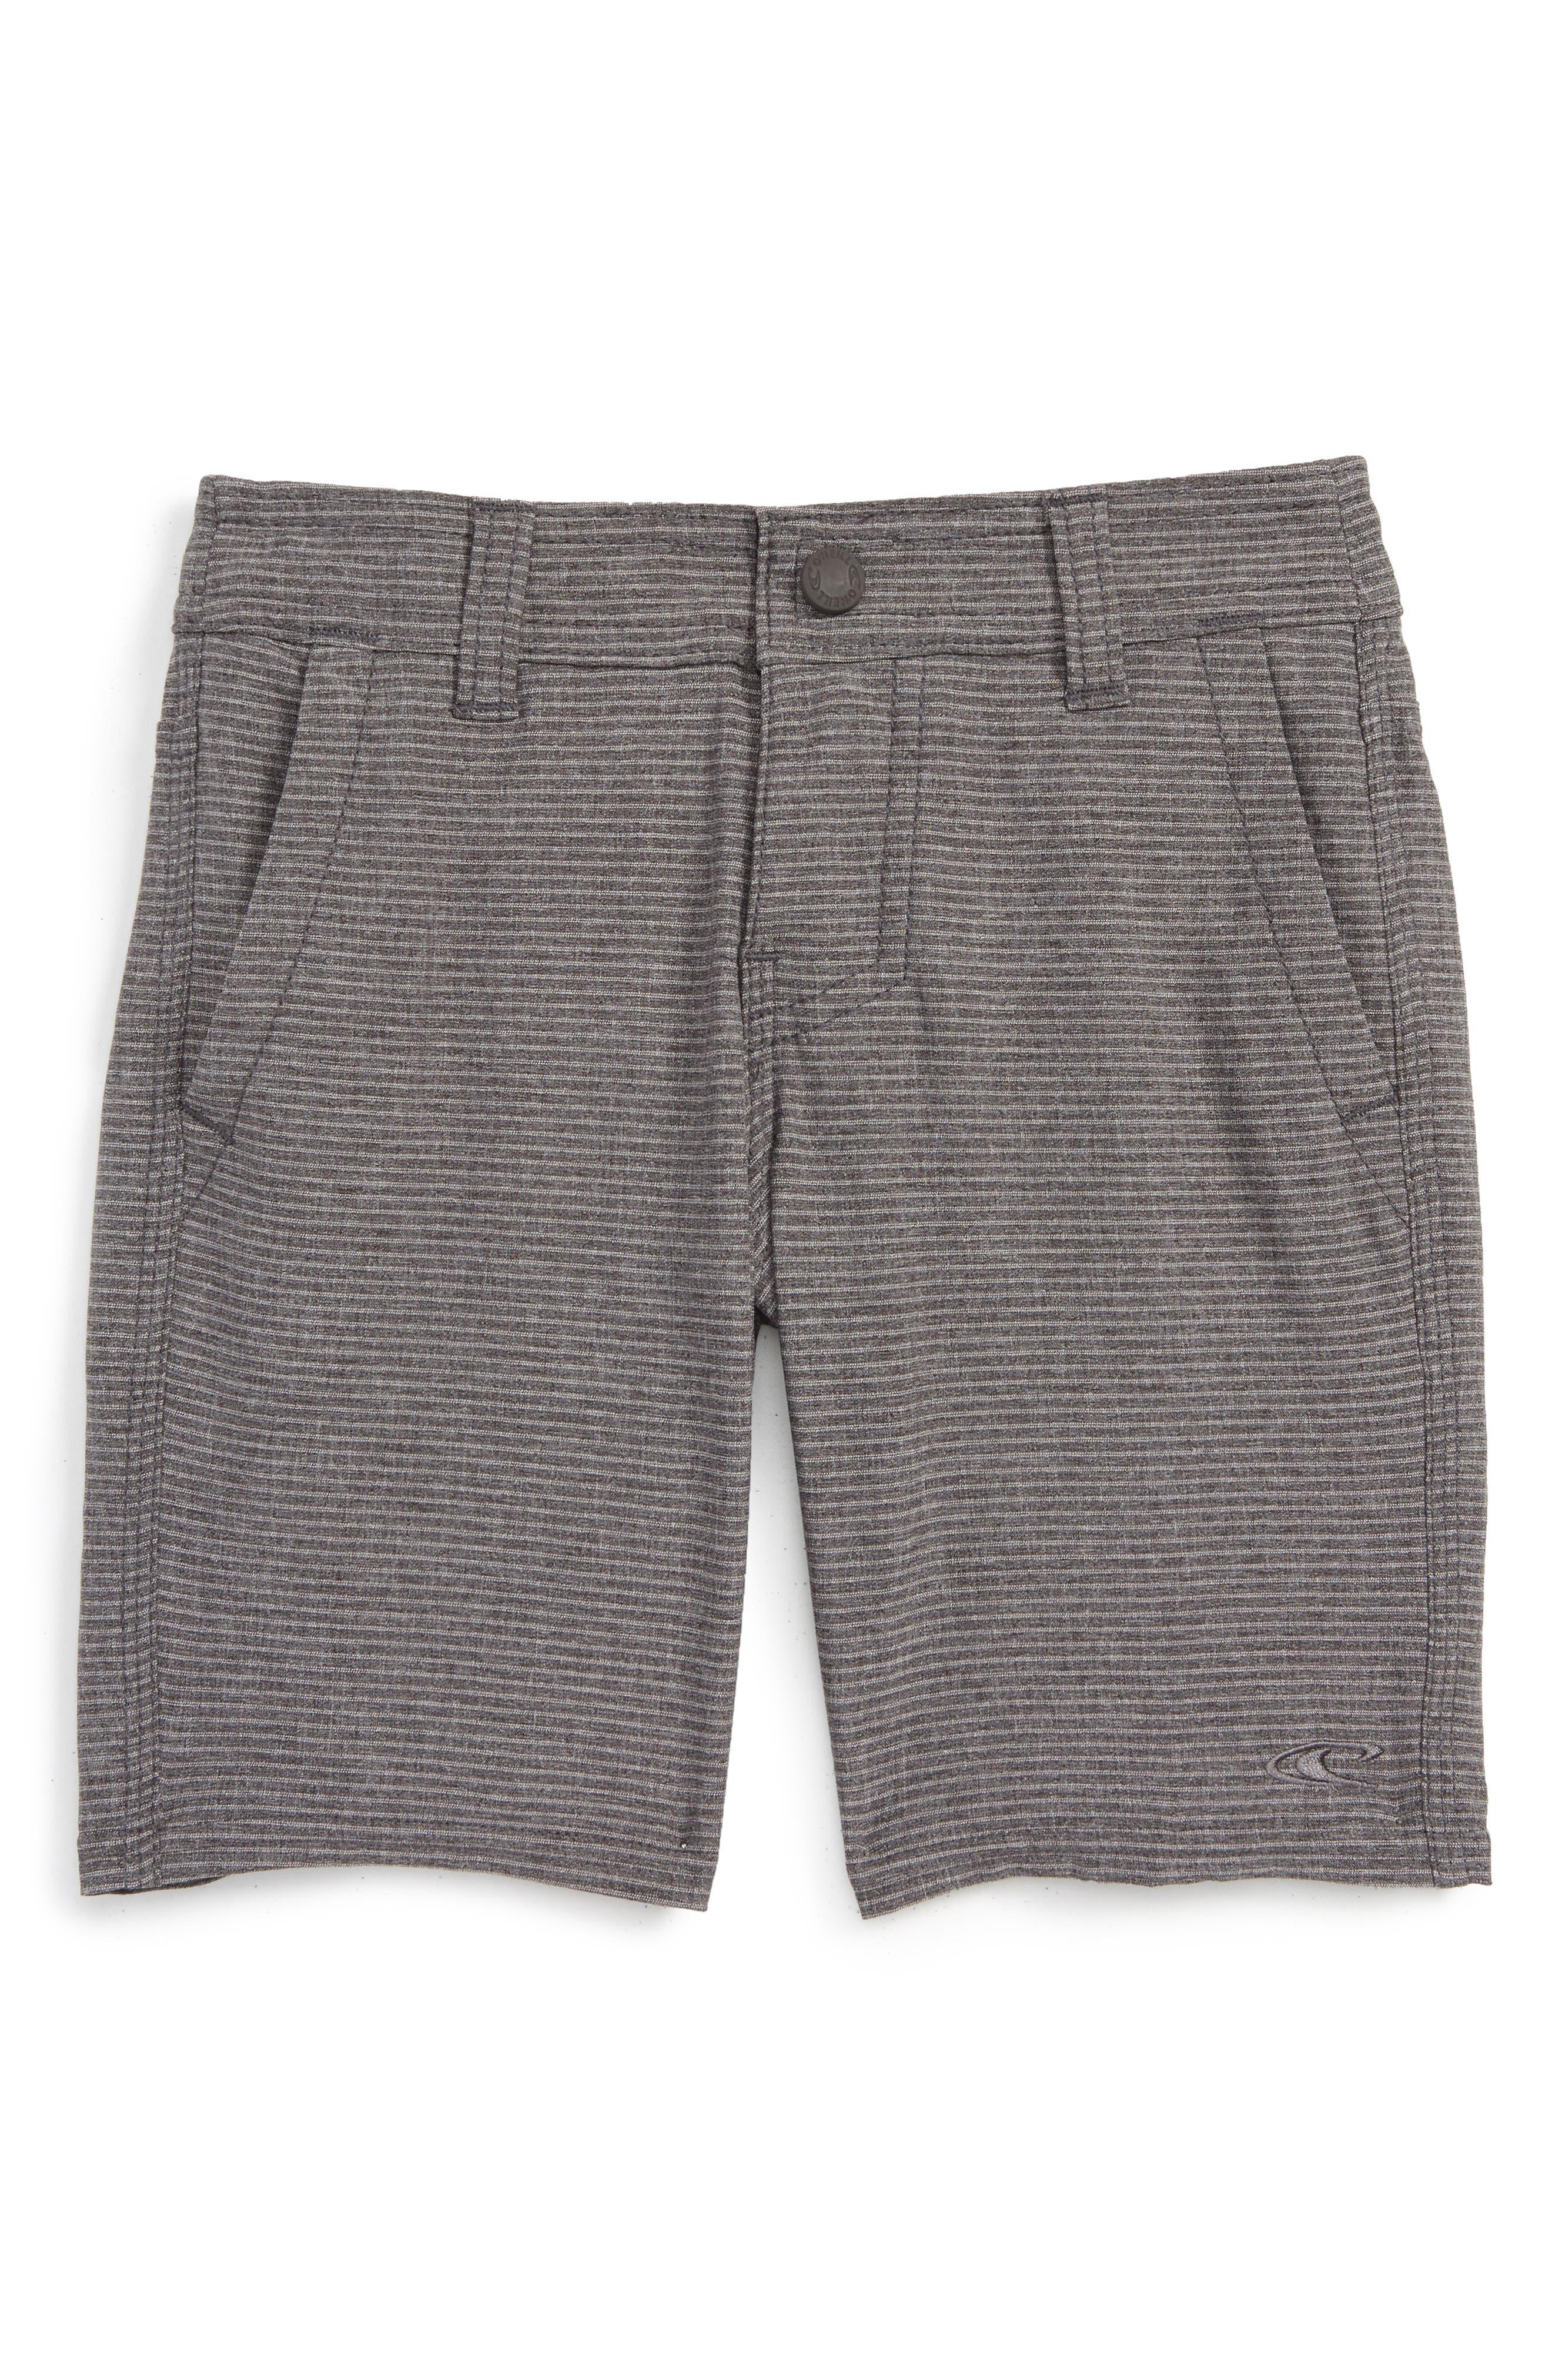 O'Neill Locked Stripe Hybrid Shorts (Toddler Boys & Little Boys)